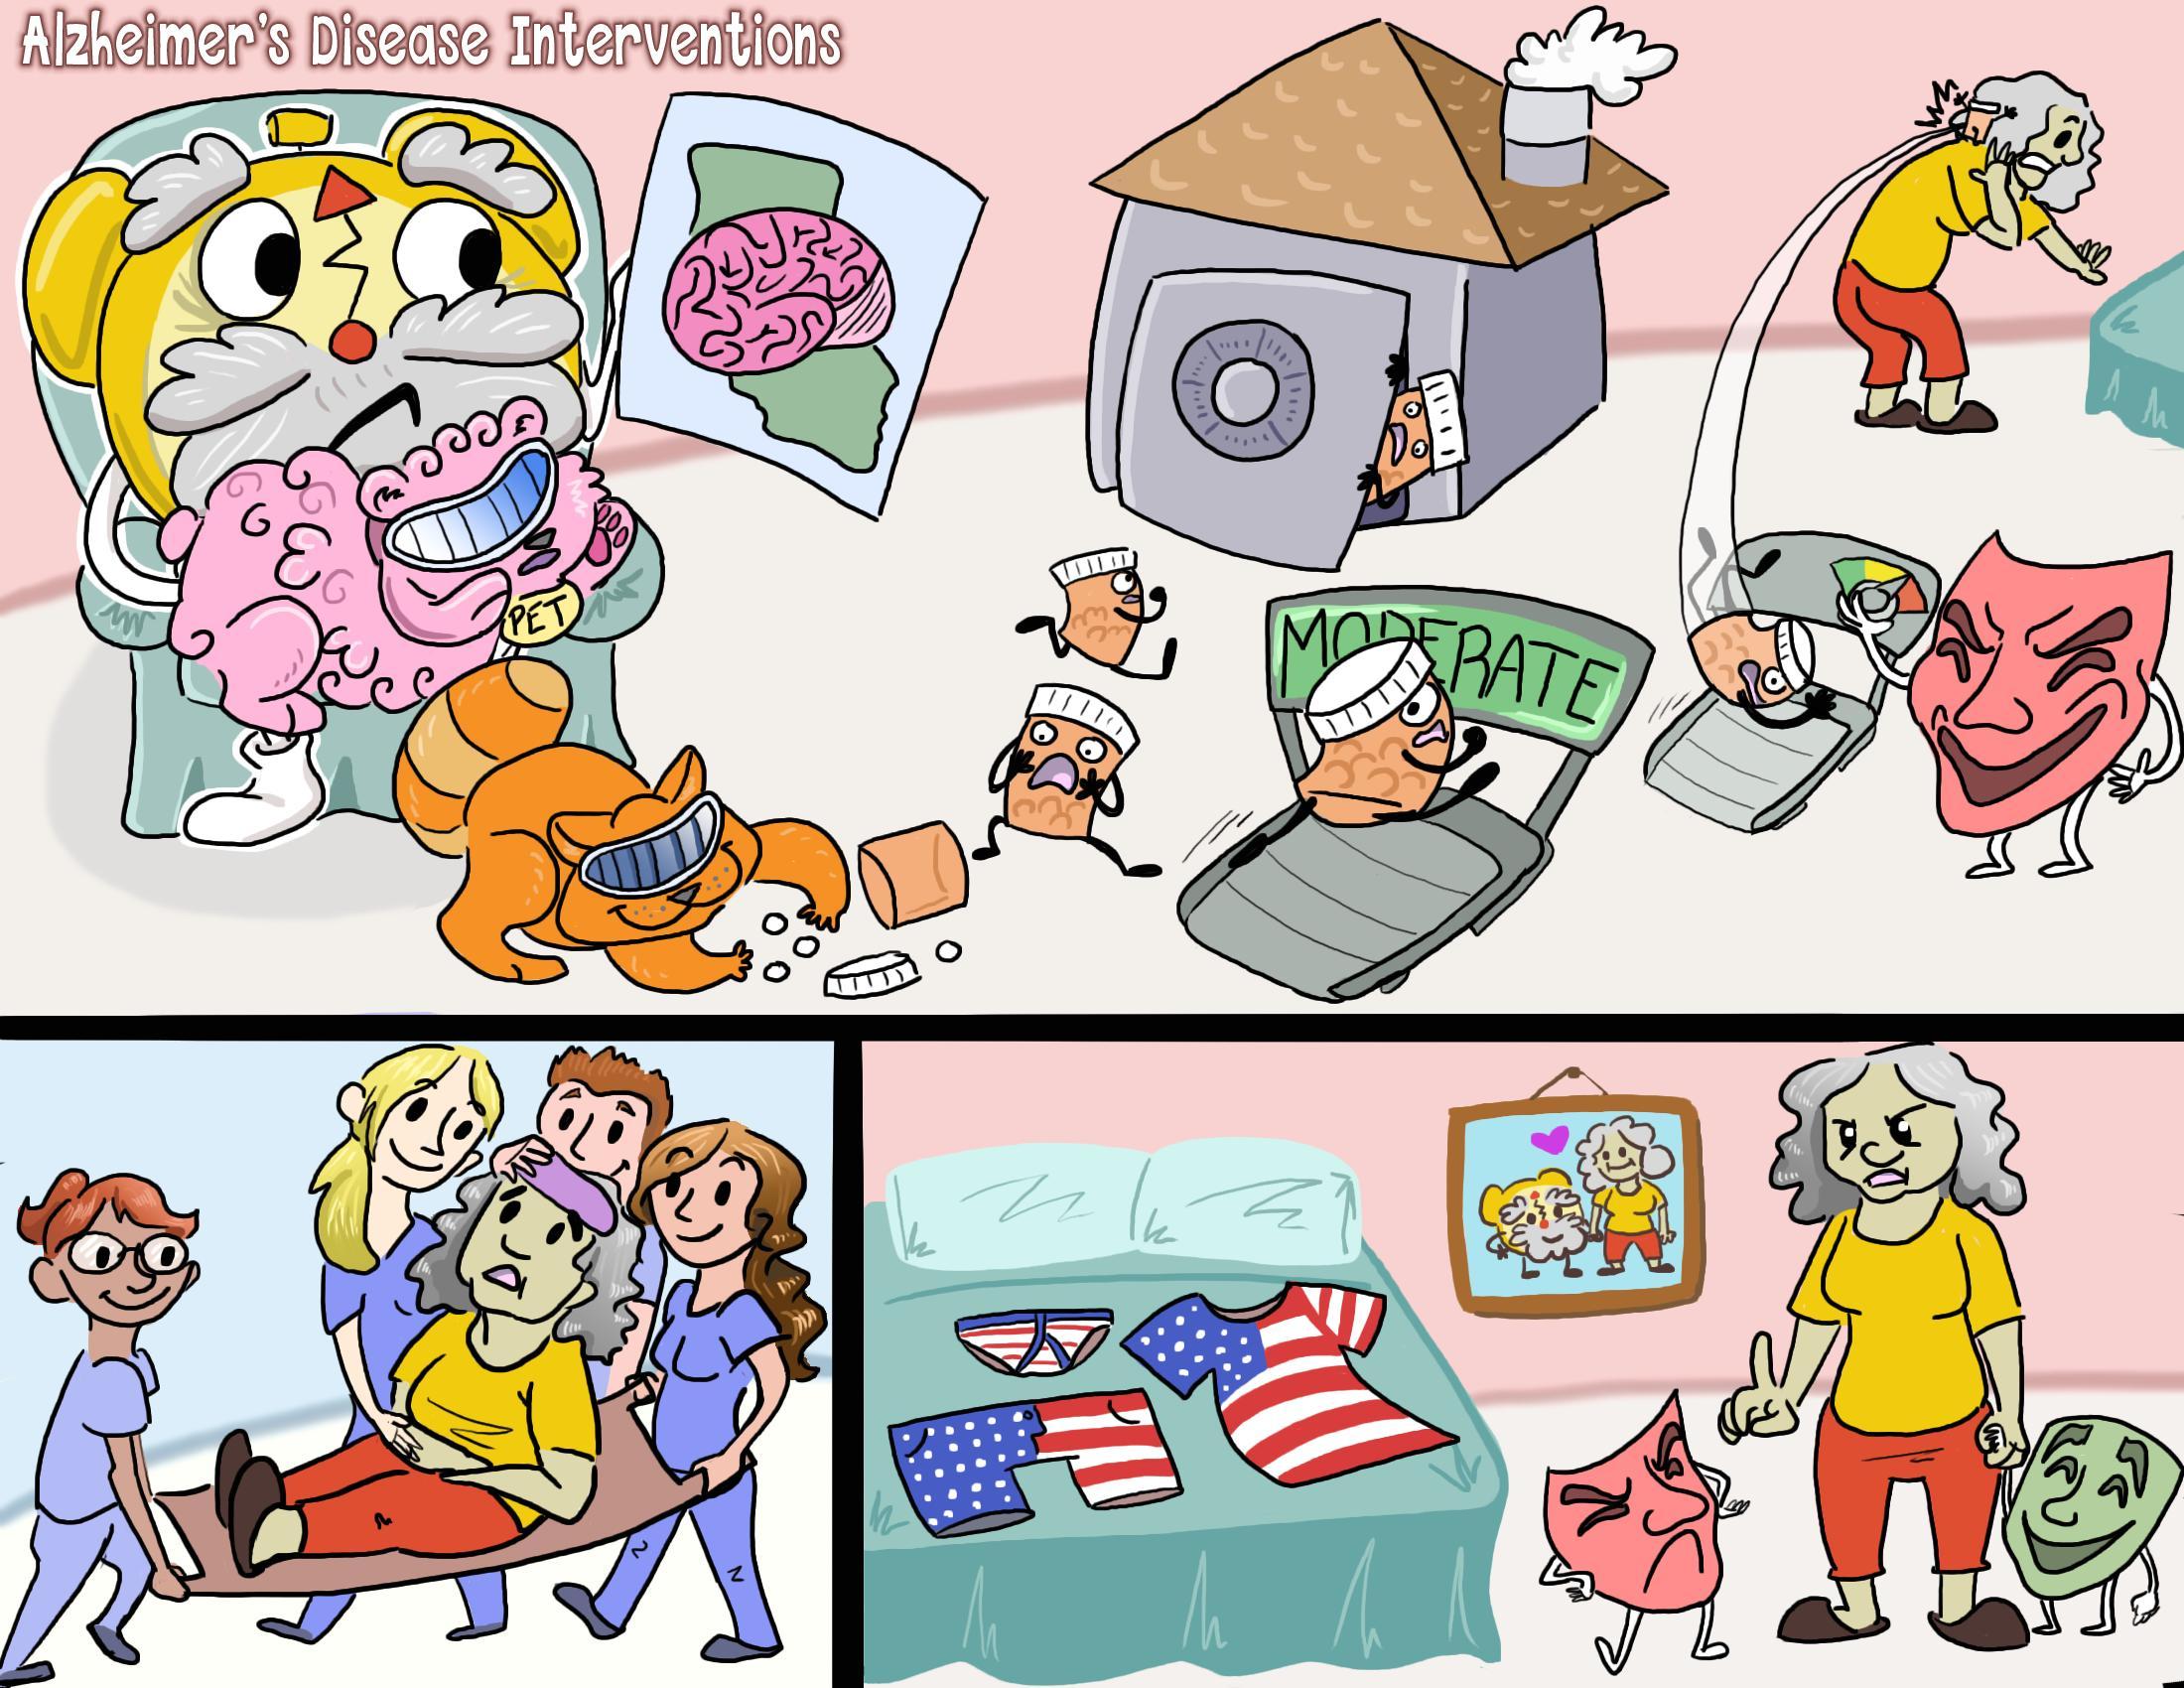 Alzheimer's Disease Interventions